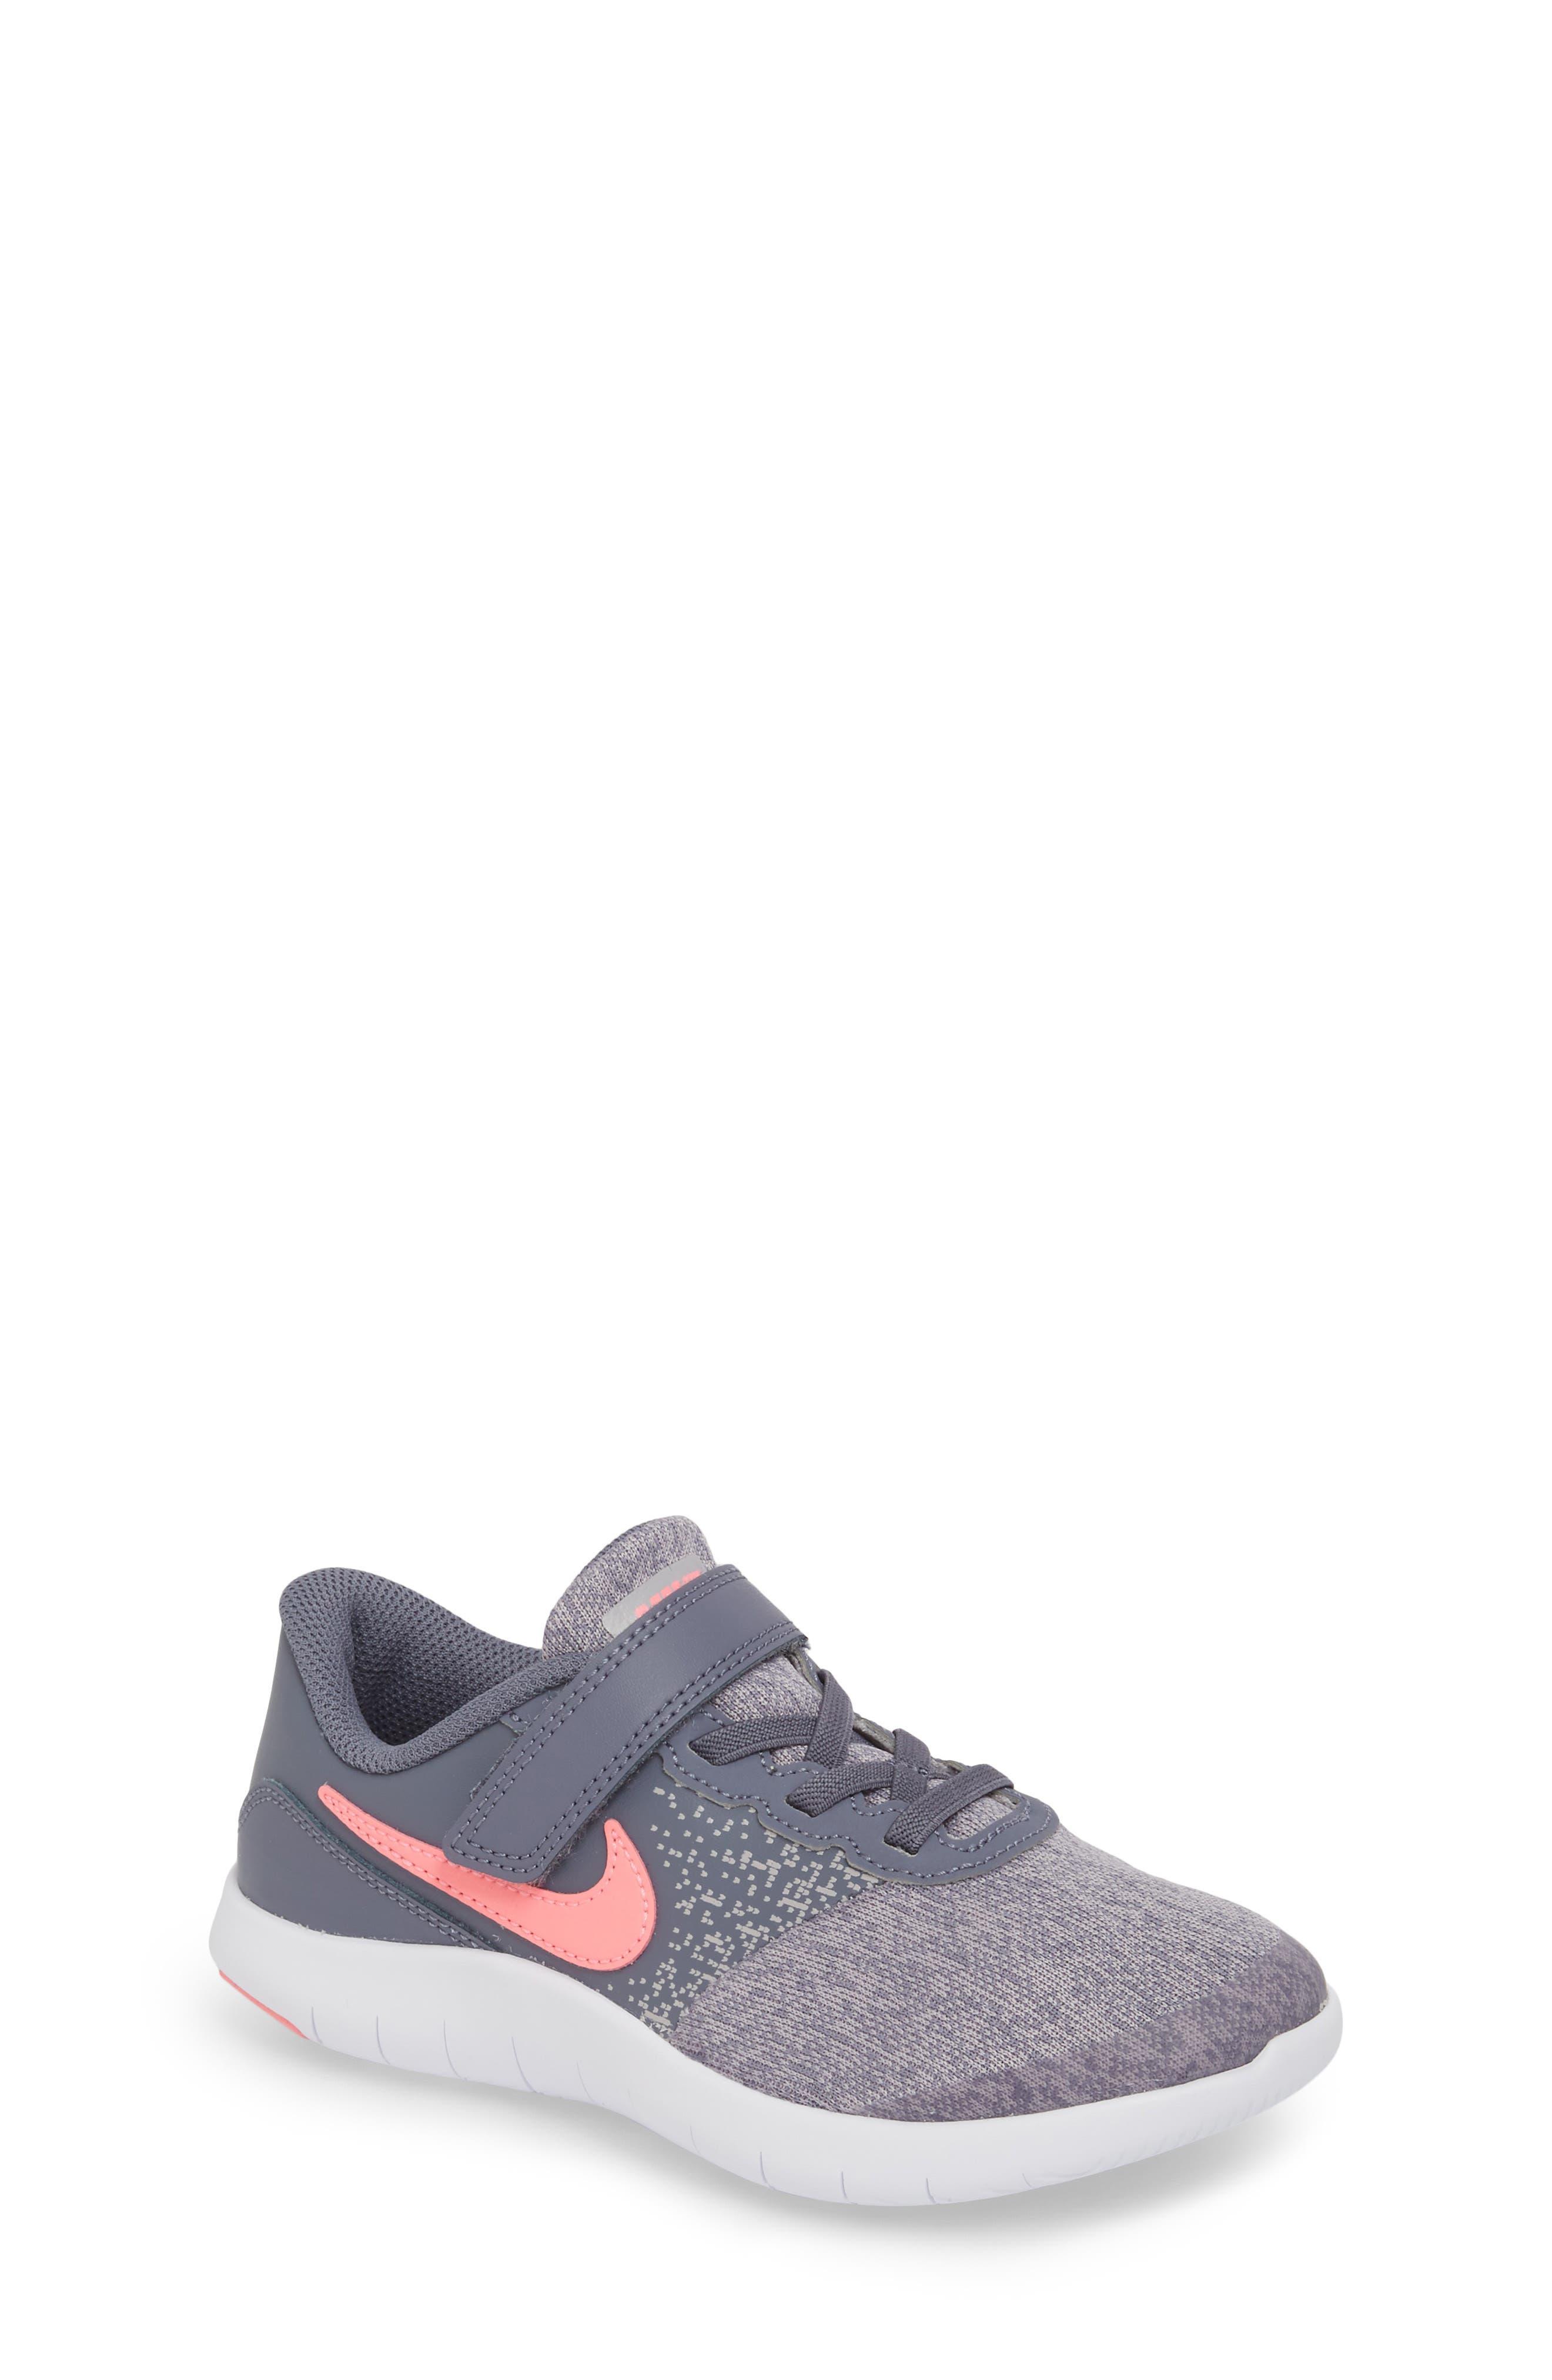 Flex Contact Running Shoe,                         Main,                         color, LIGHT CARBON/ SUNSET PULSE